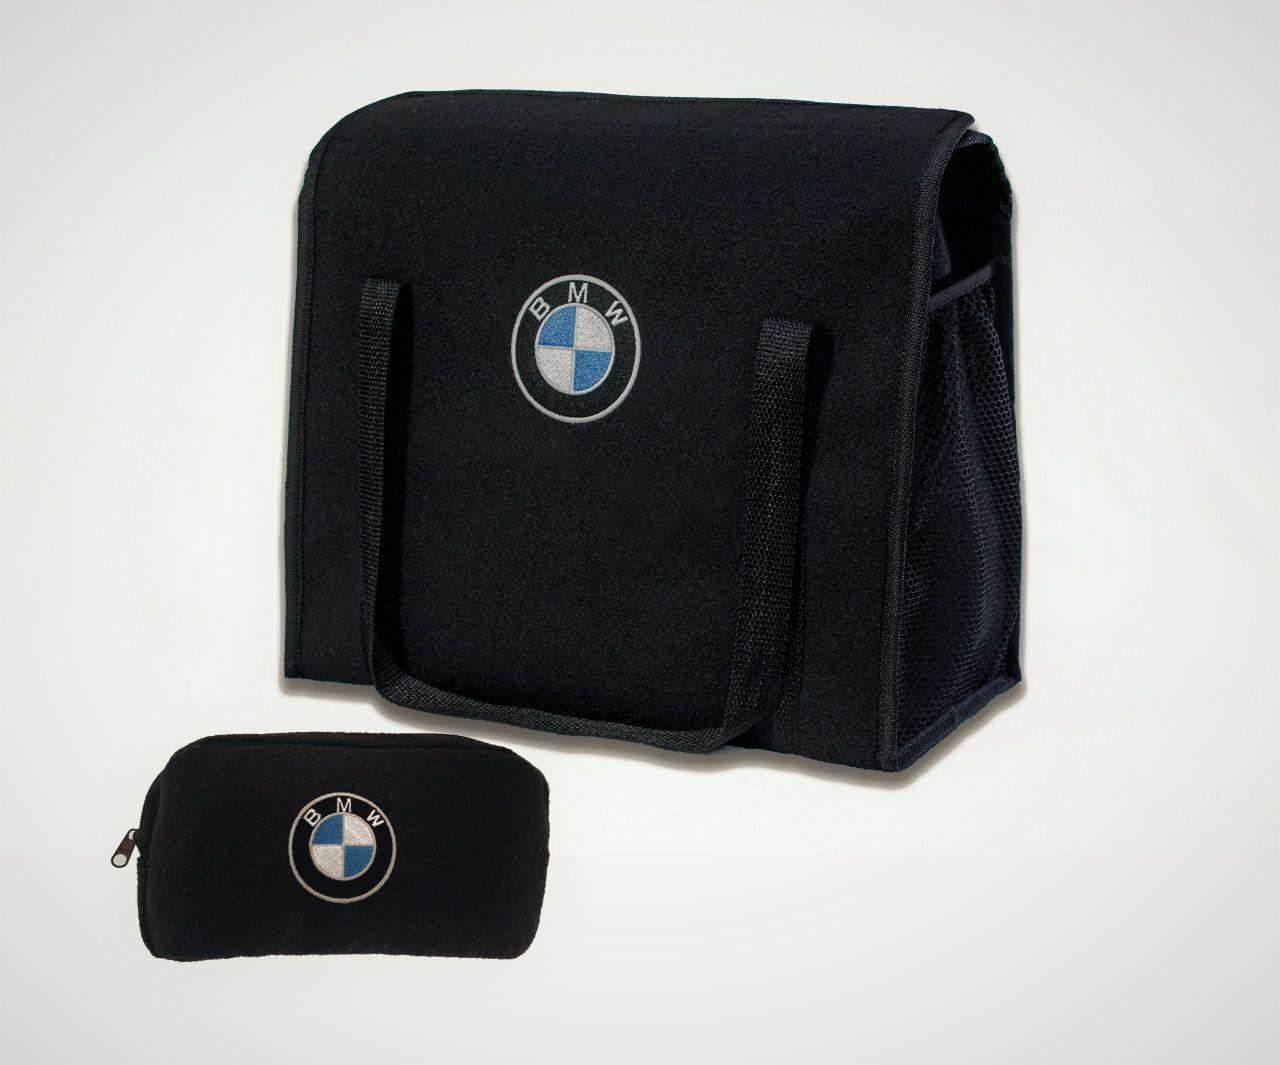 Kit Bolsa Organizadora Porta Malas e Necessaire Porta Luvas BMW